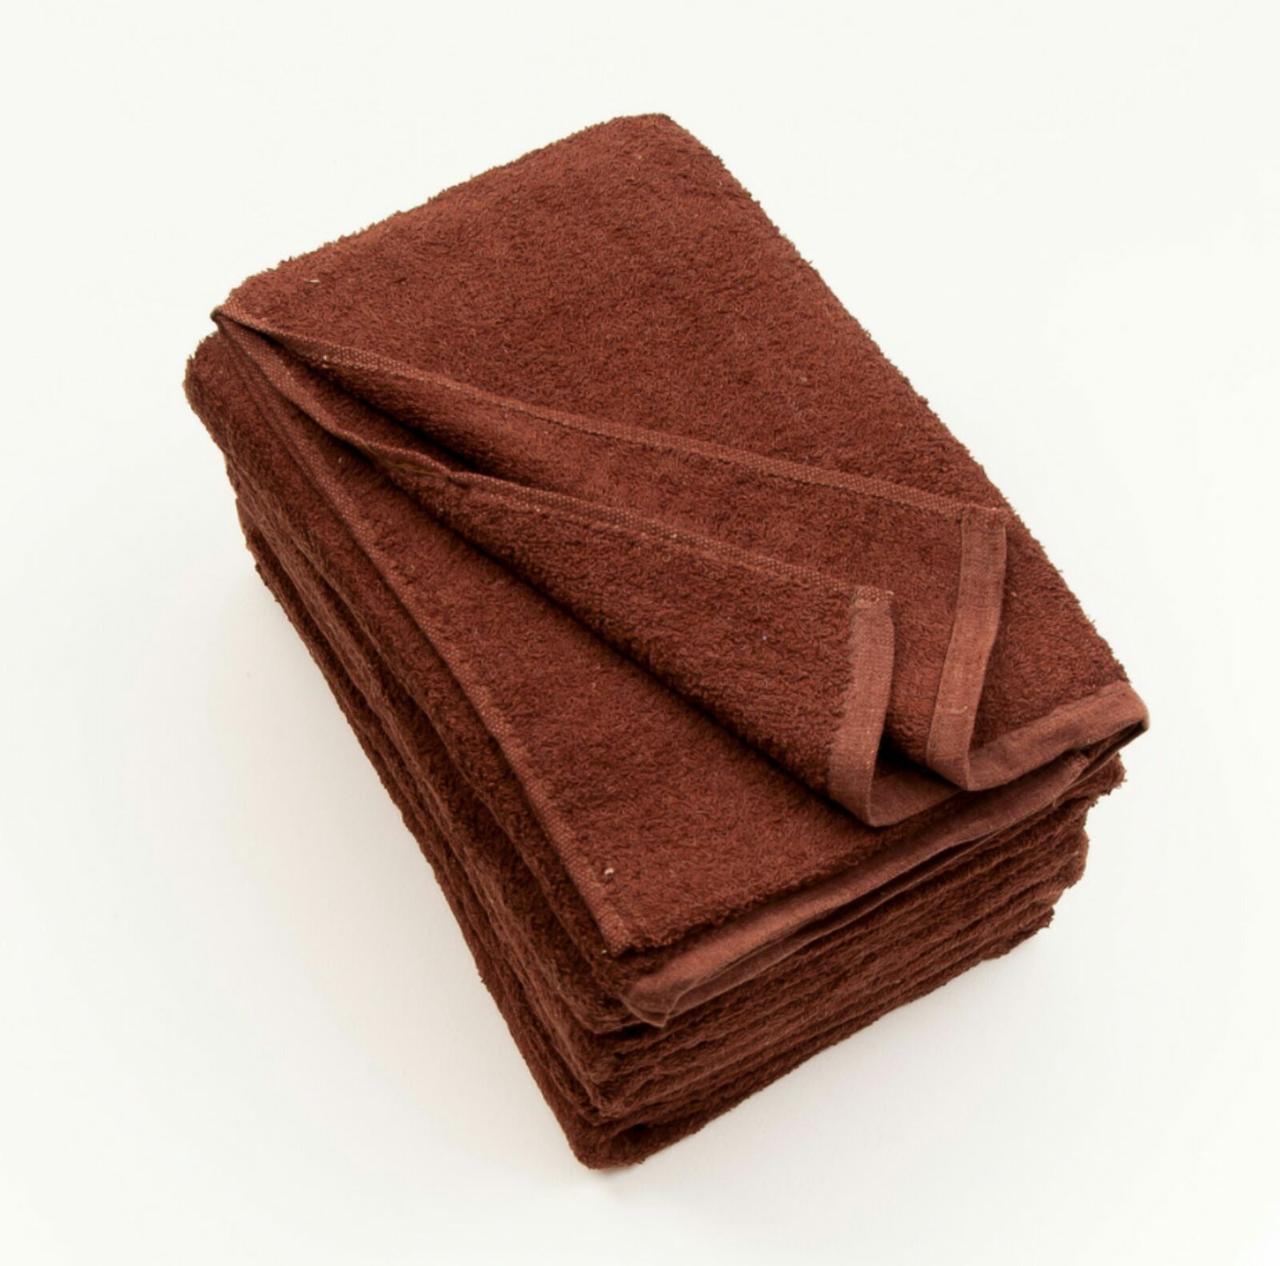 Рушник  банний. МАХРА. Коричневого кольору.